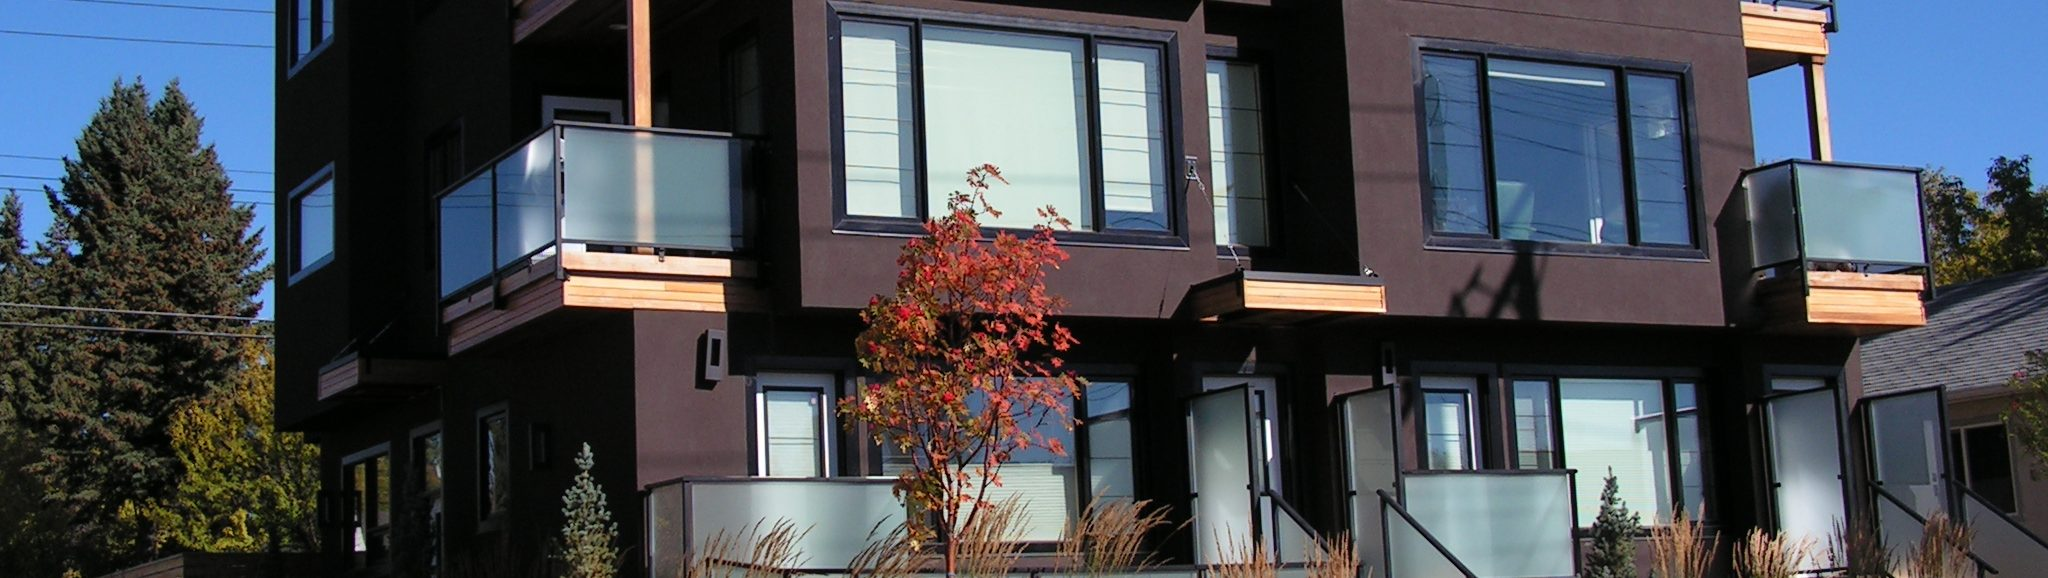 modular-multi-family-home